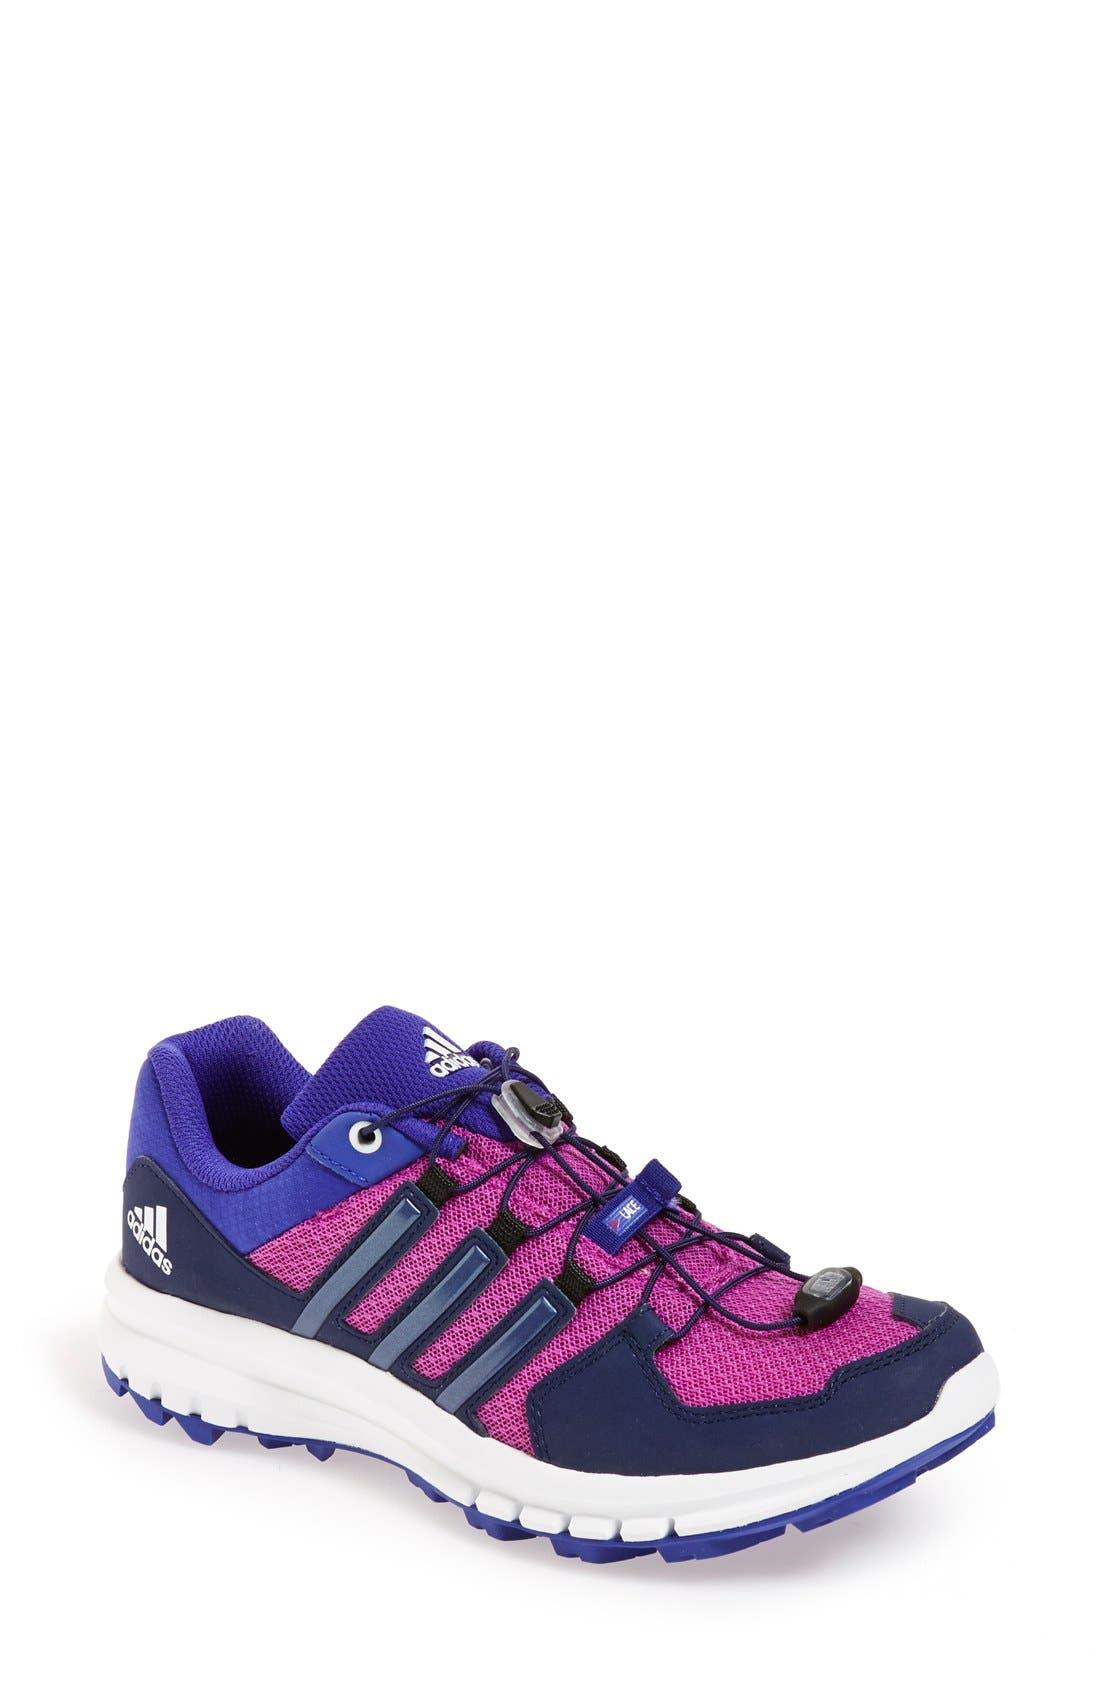 Alternate Image 1 Selected - adidas 'Duramo Cross Trail' Running Shoe (Women)